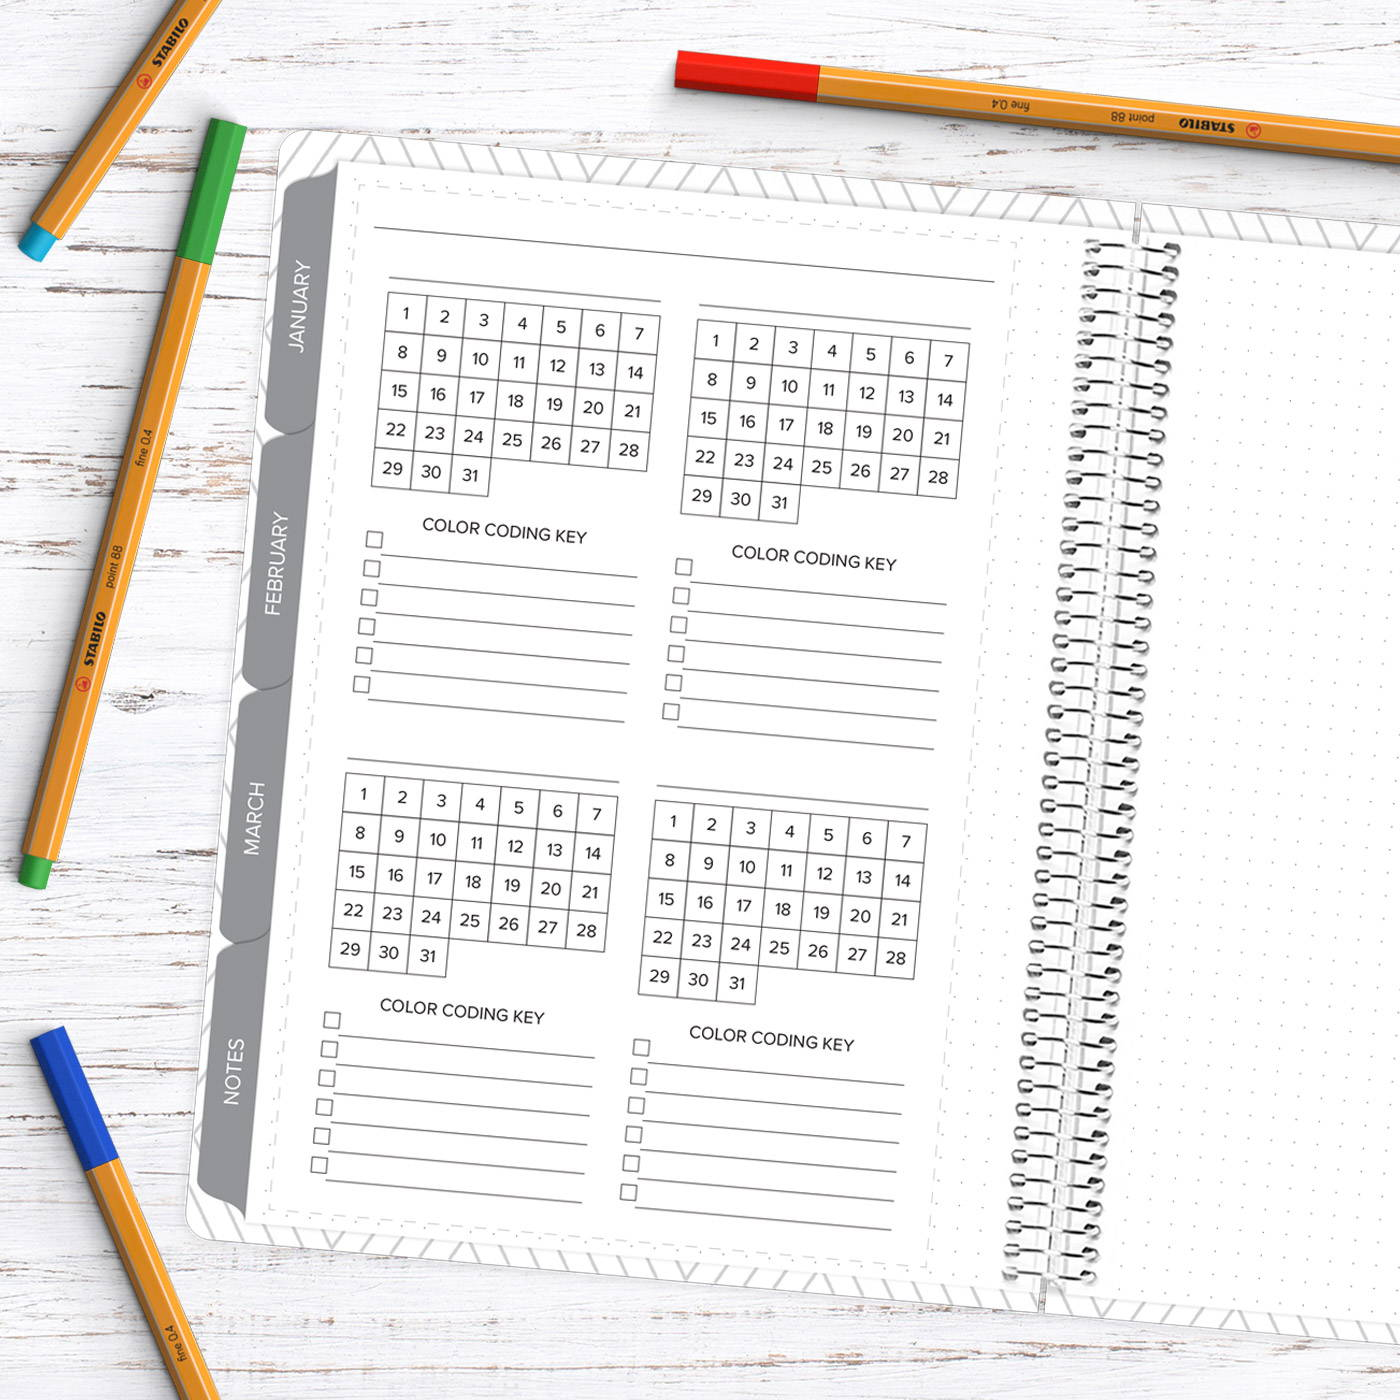 Amplify Planner 3 month goals freebie download